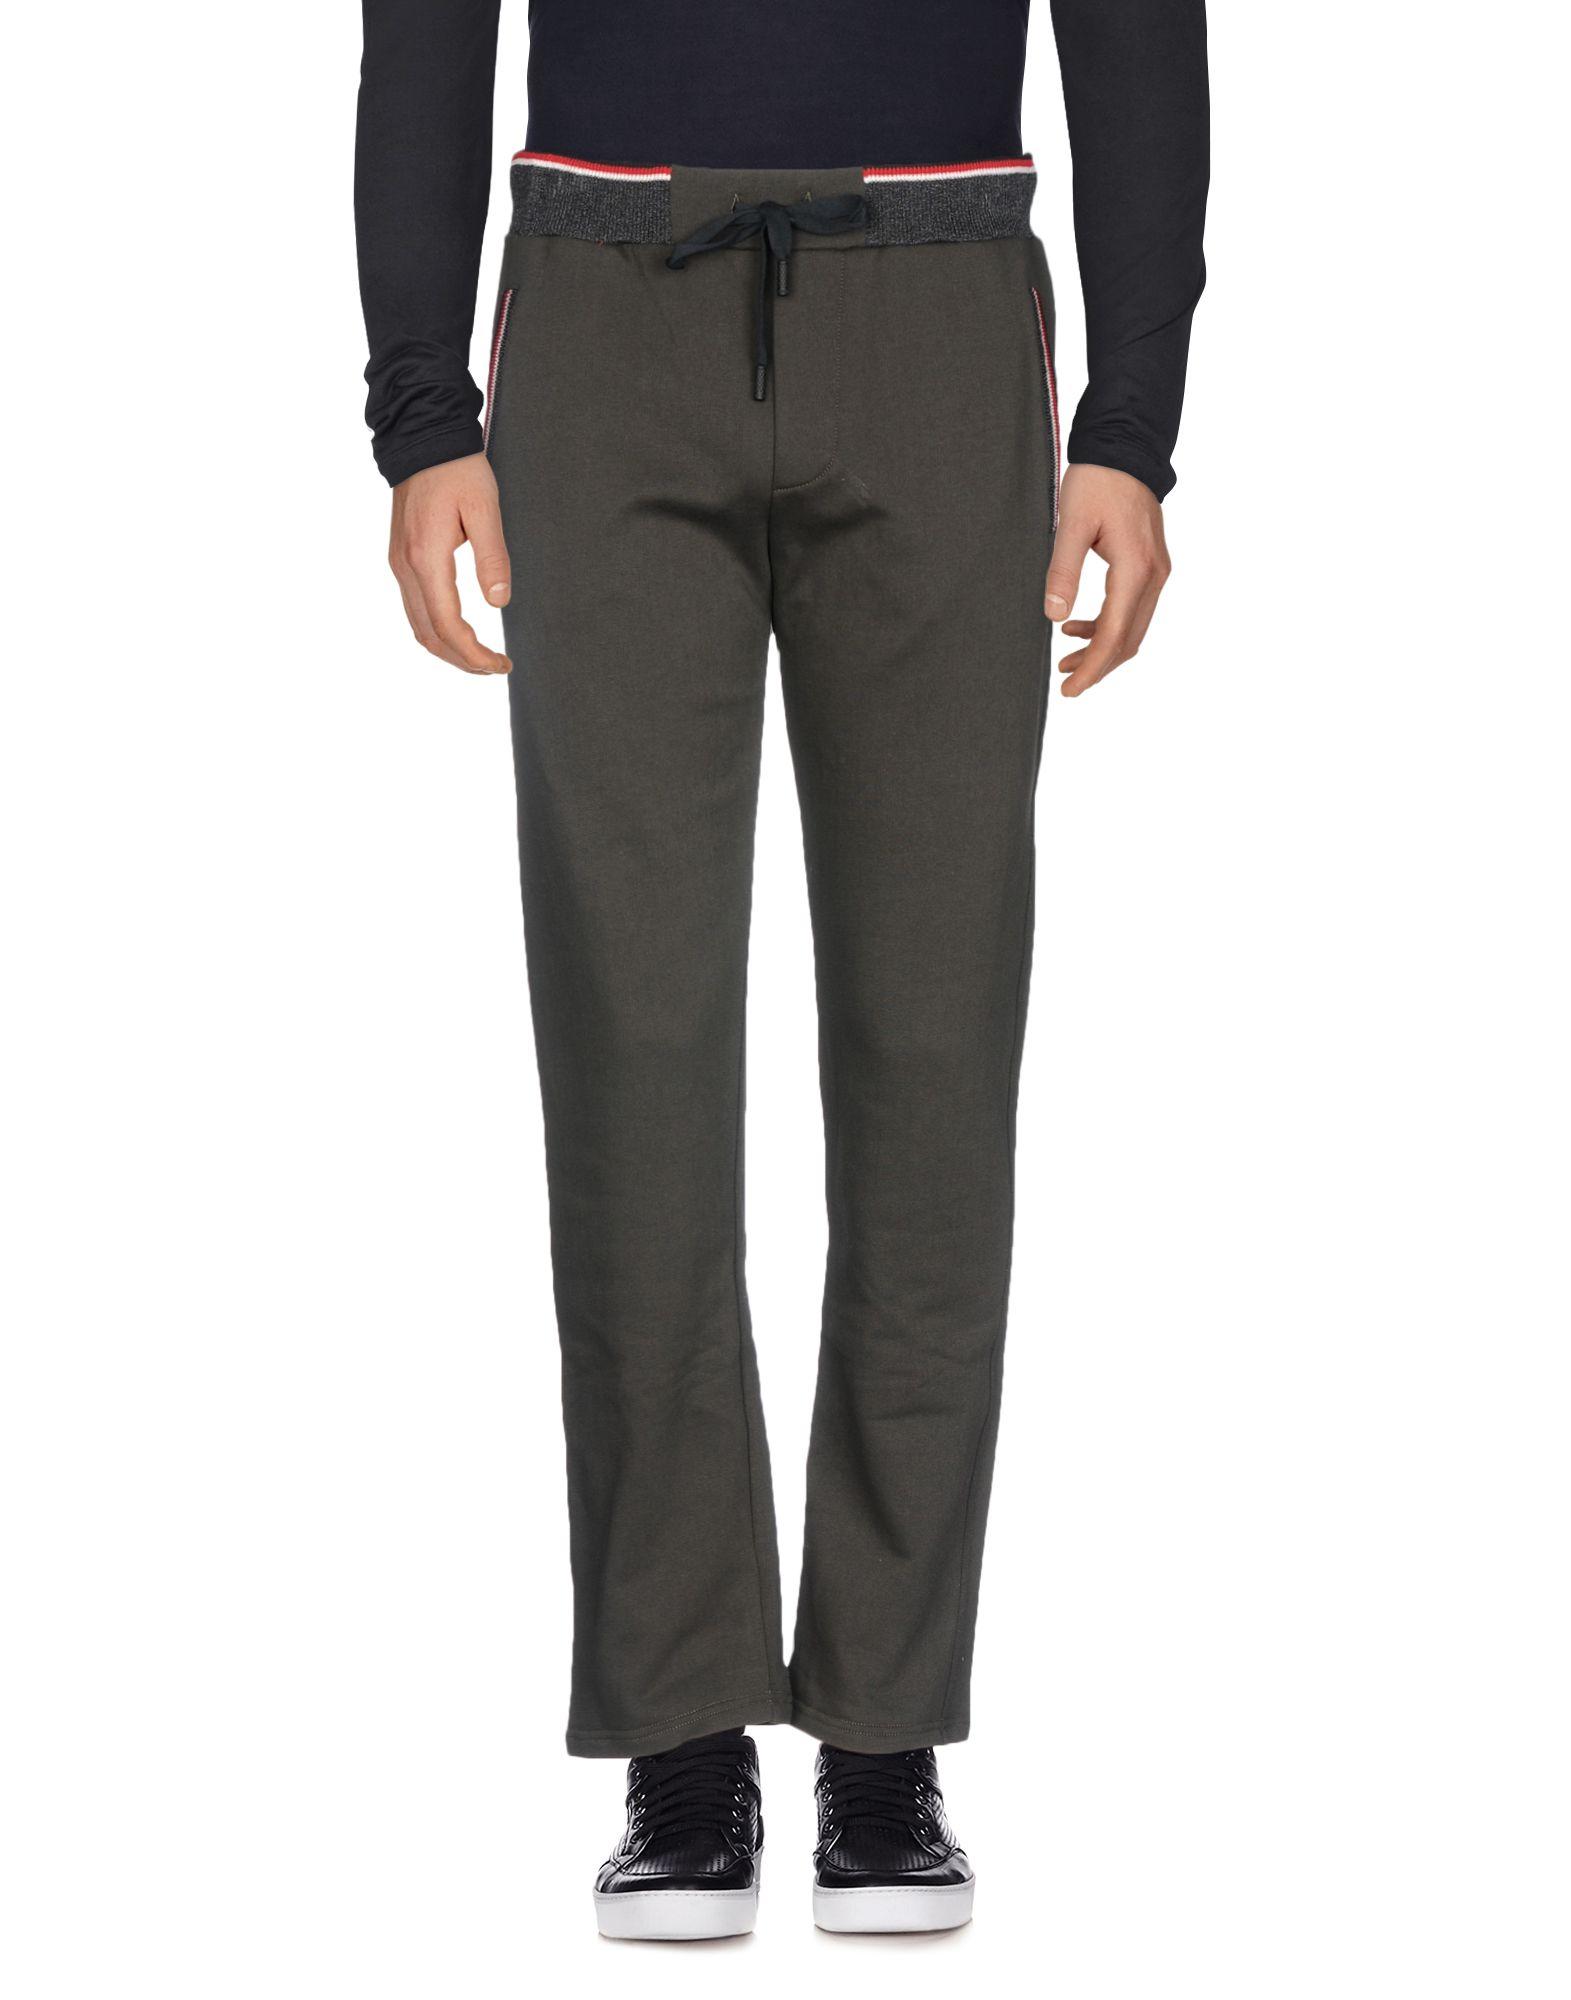 Pantalone Roberto Cavalli Gym Uomo - Acquista online su